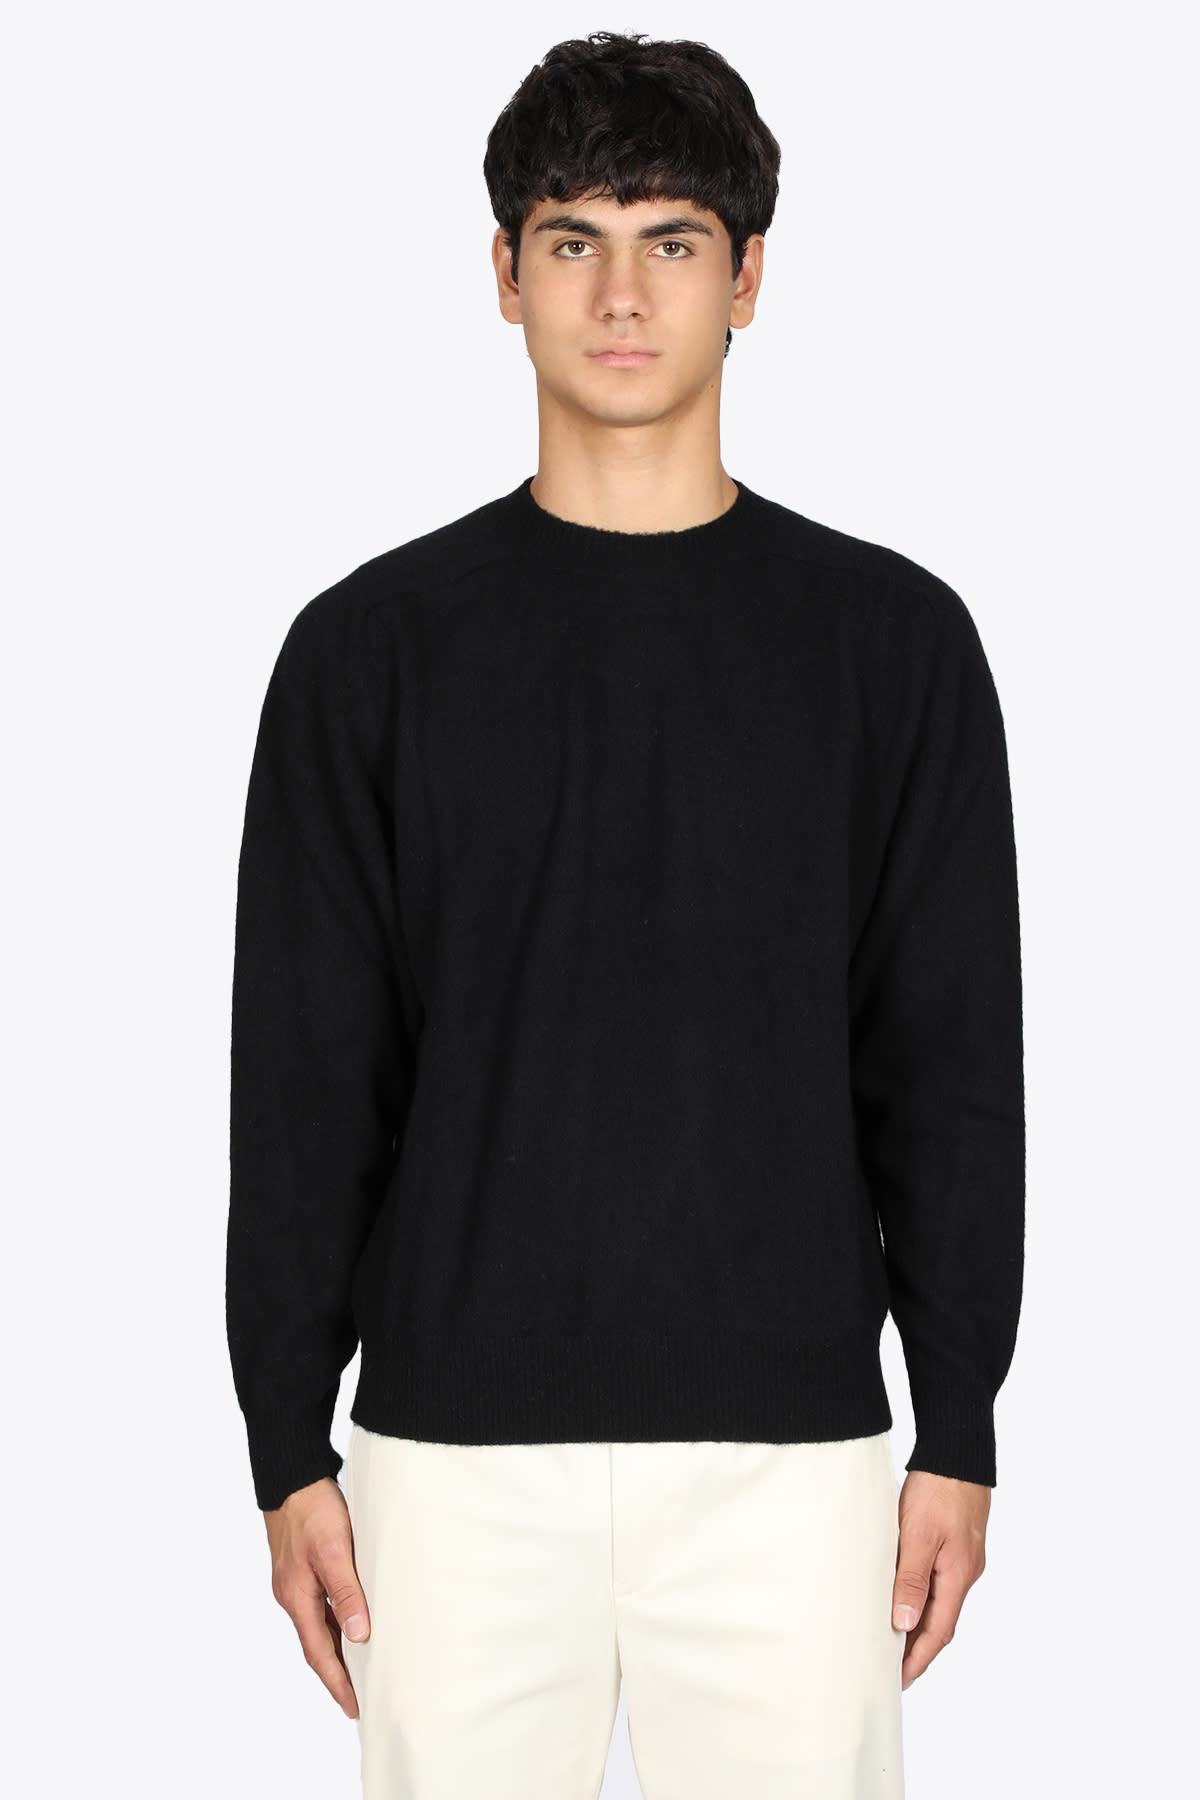 Black Wool Crewneck Sweater